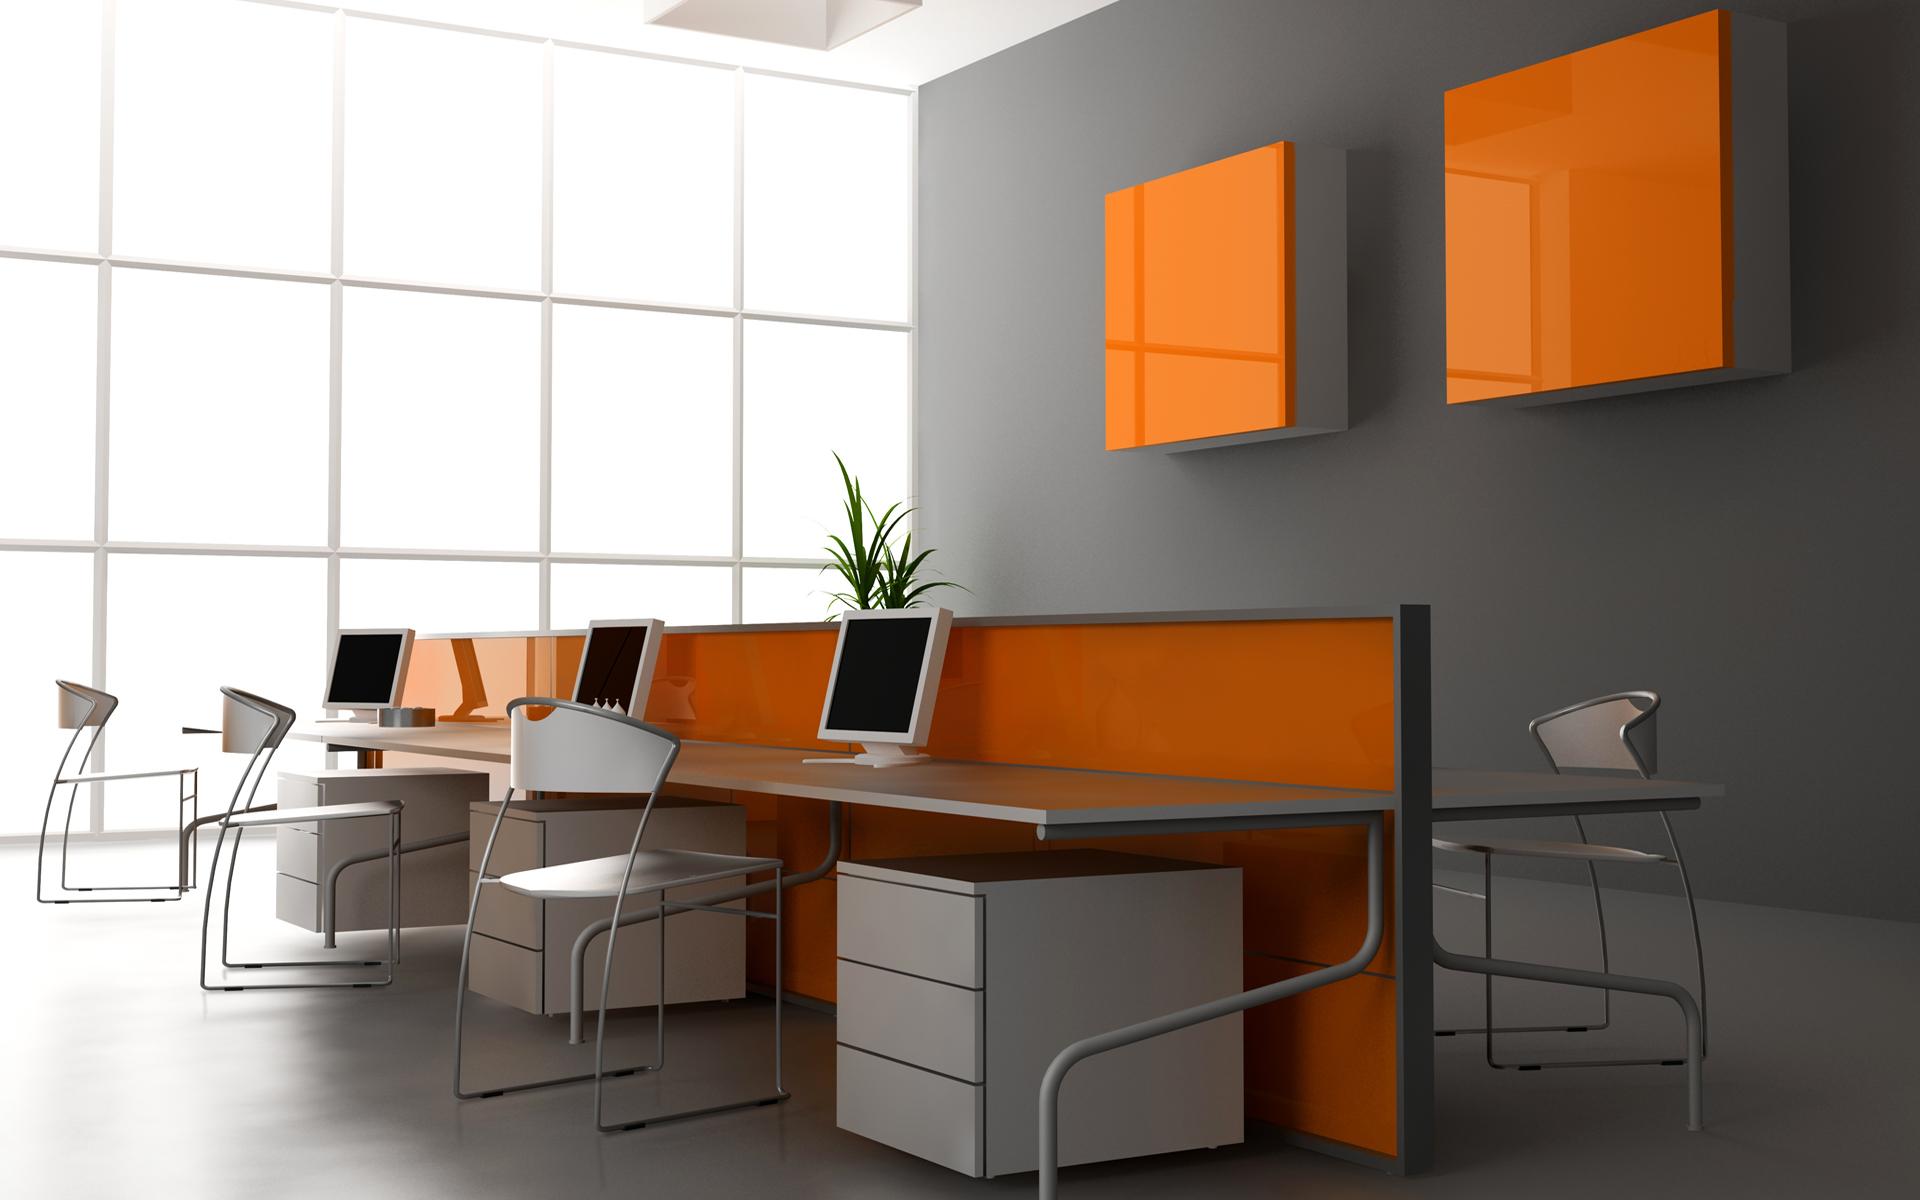 ... wordpress.com/2011/04/orange-office-room-interior-design-wallpaper.jpg